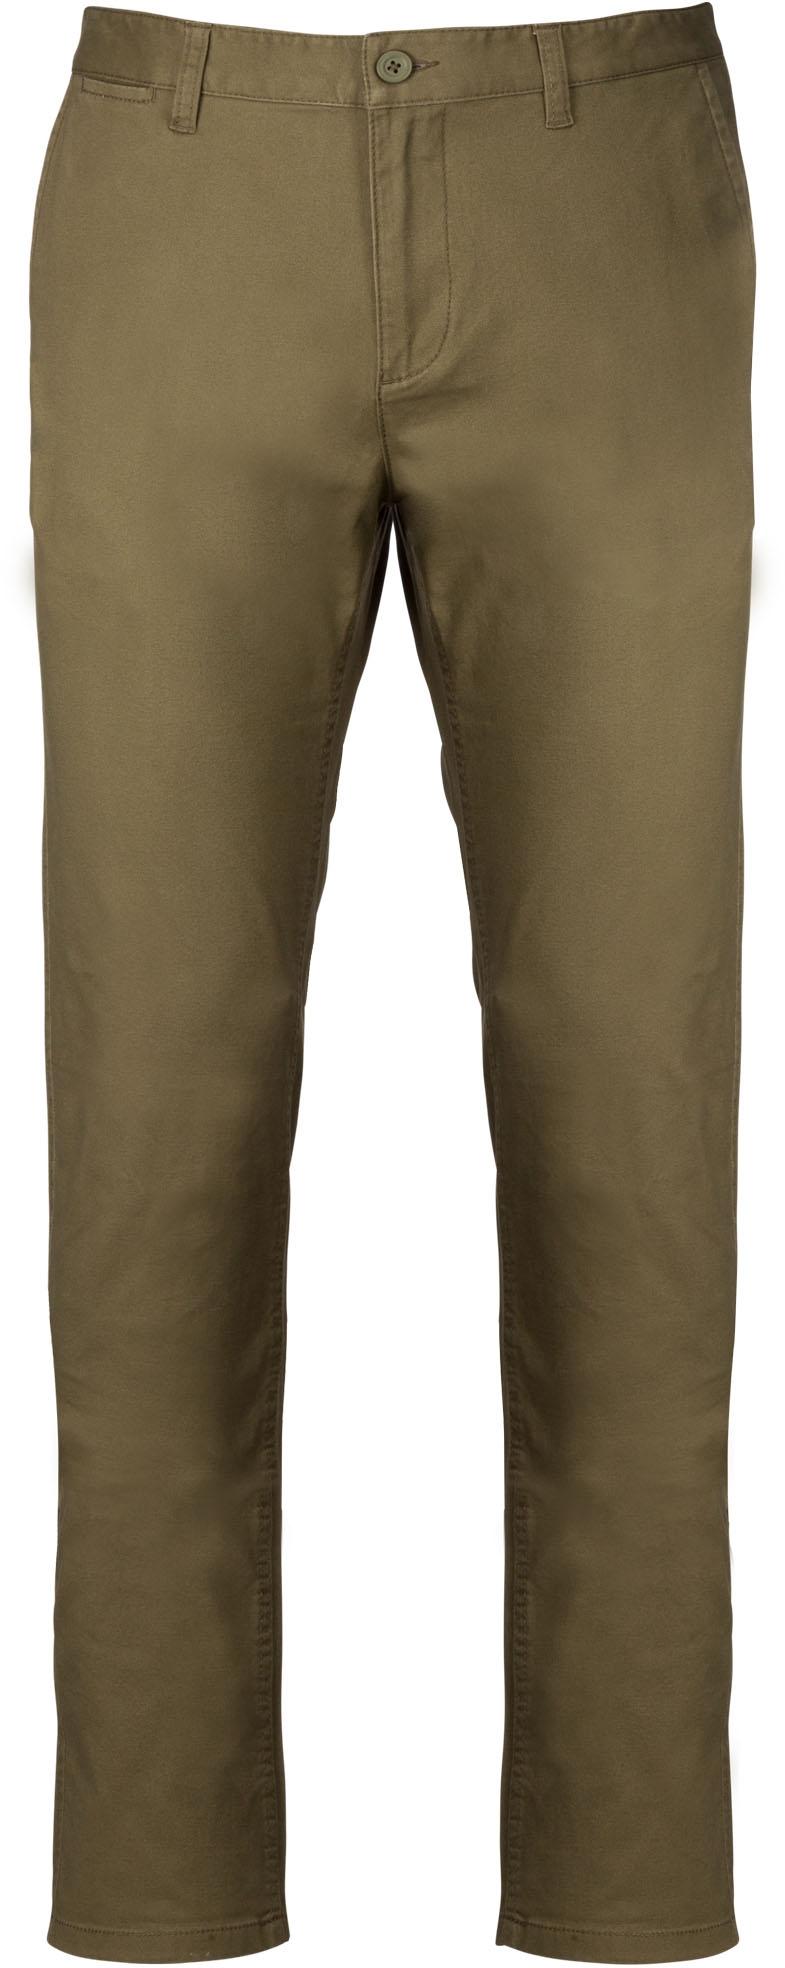 Pantalon chino homme - 2-1478-7